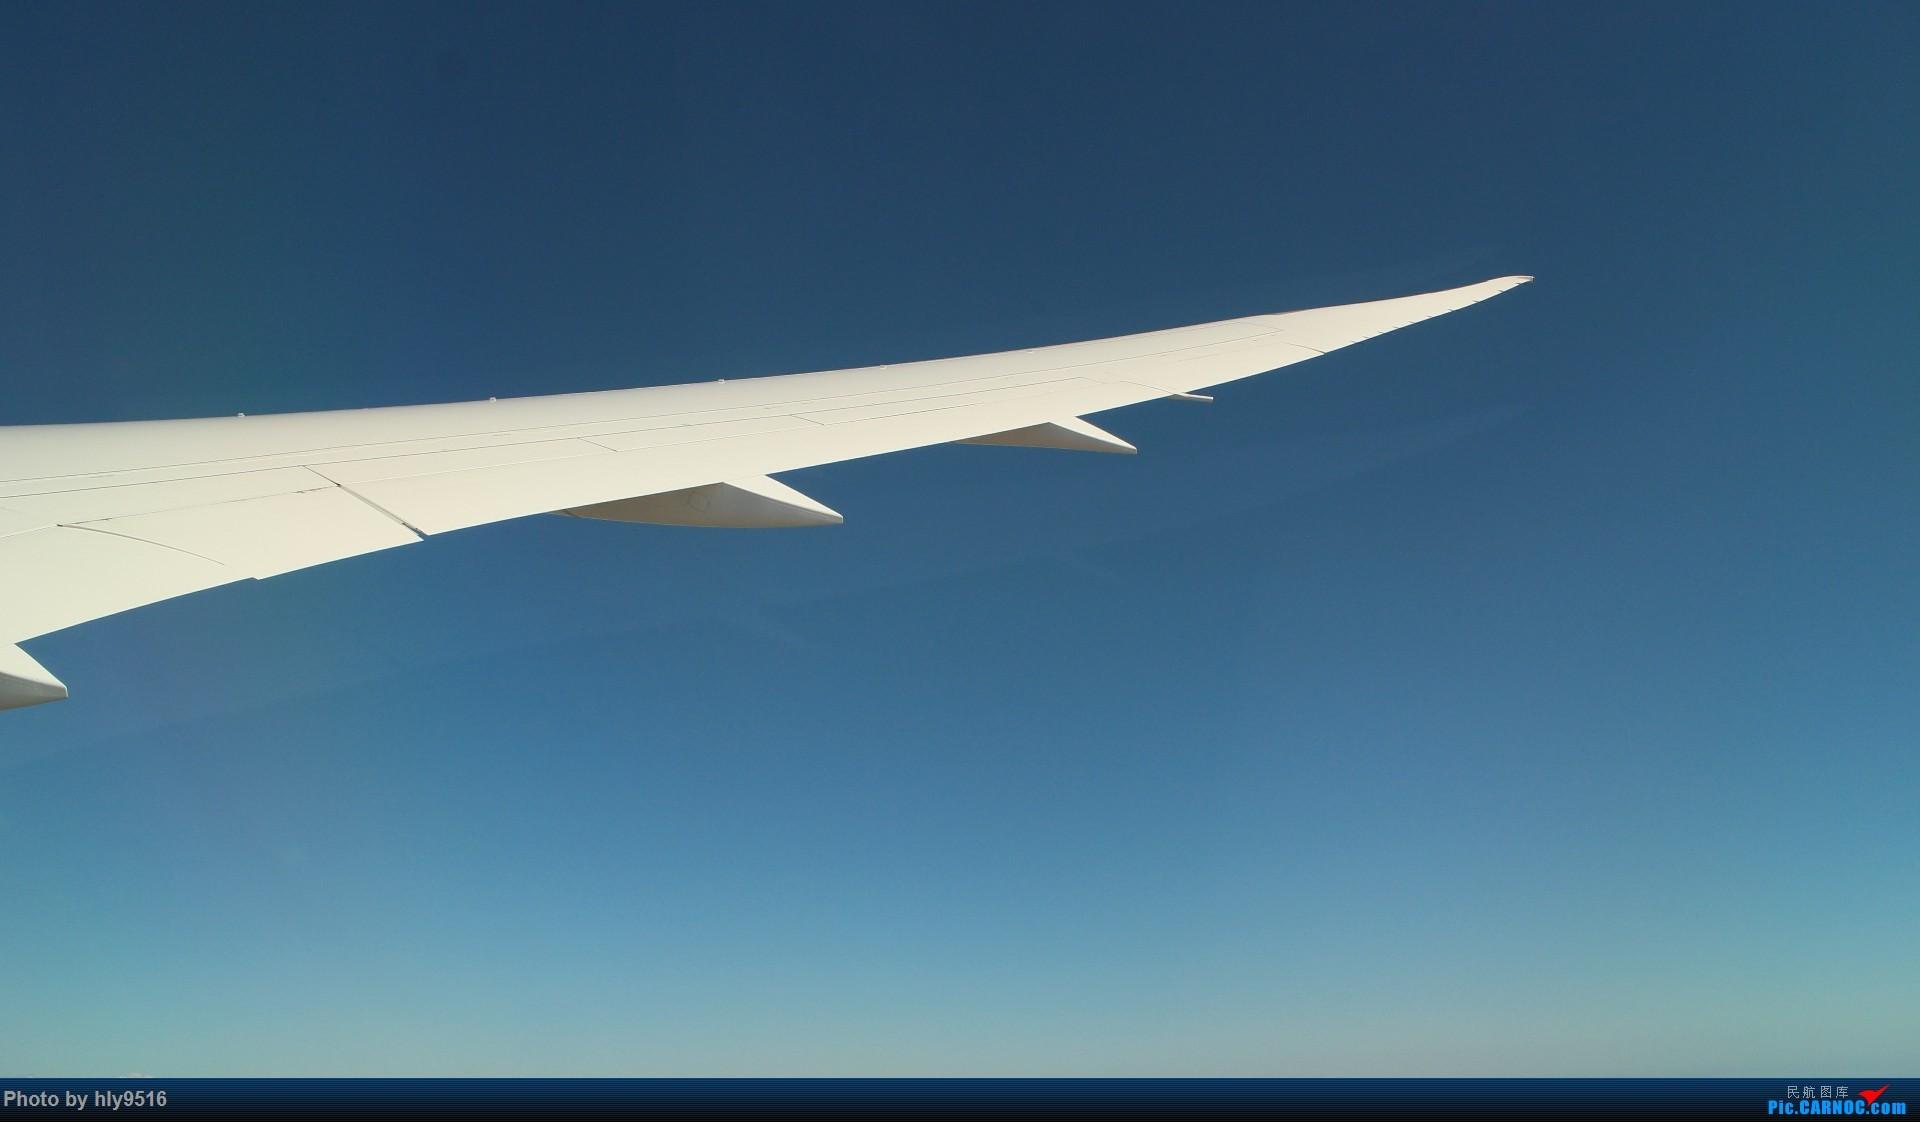 Re:[原创]【PER-MEL】第一次发游记,体验澳航最长航线QF10澳洲国内段 BOEING 787-9 VH-ZNA 大澳洲湾